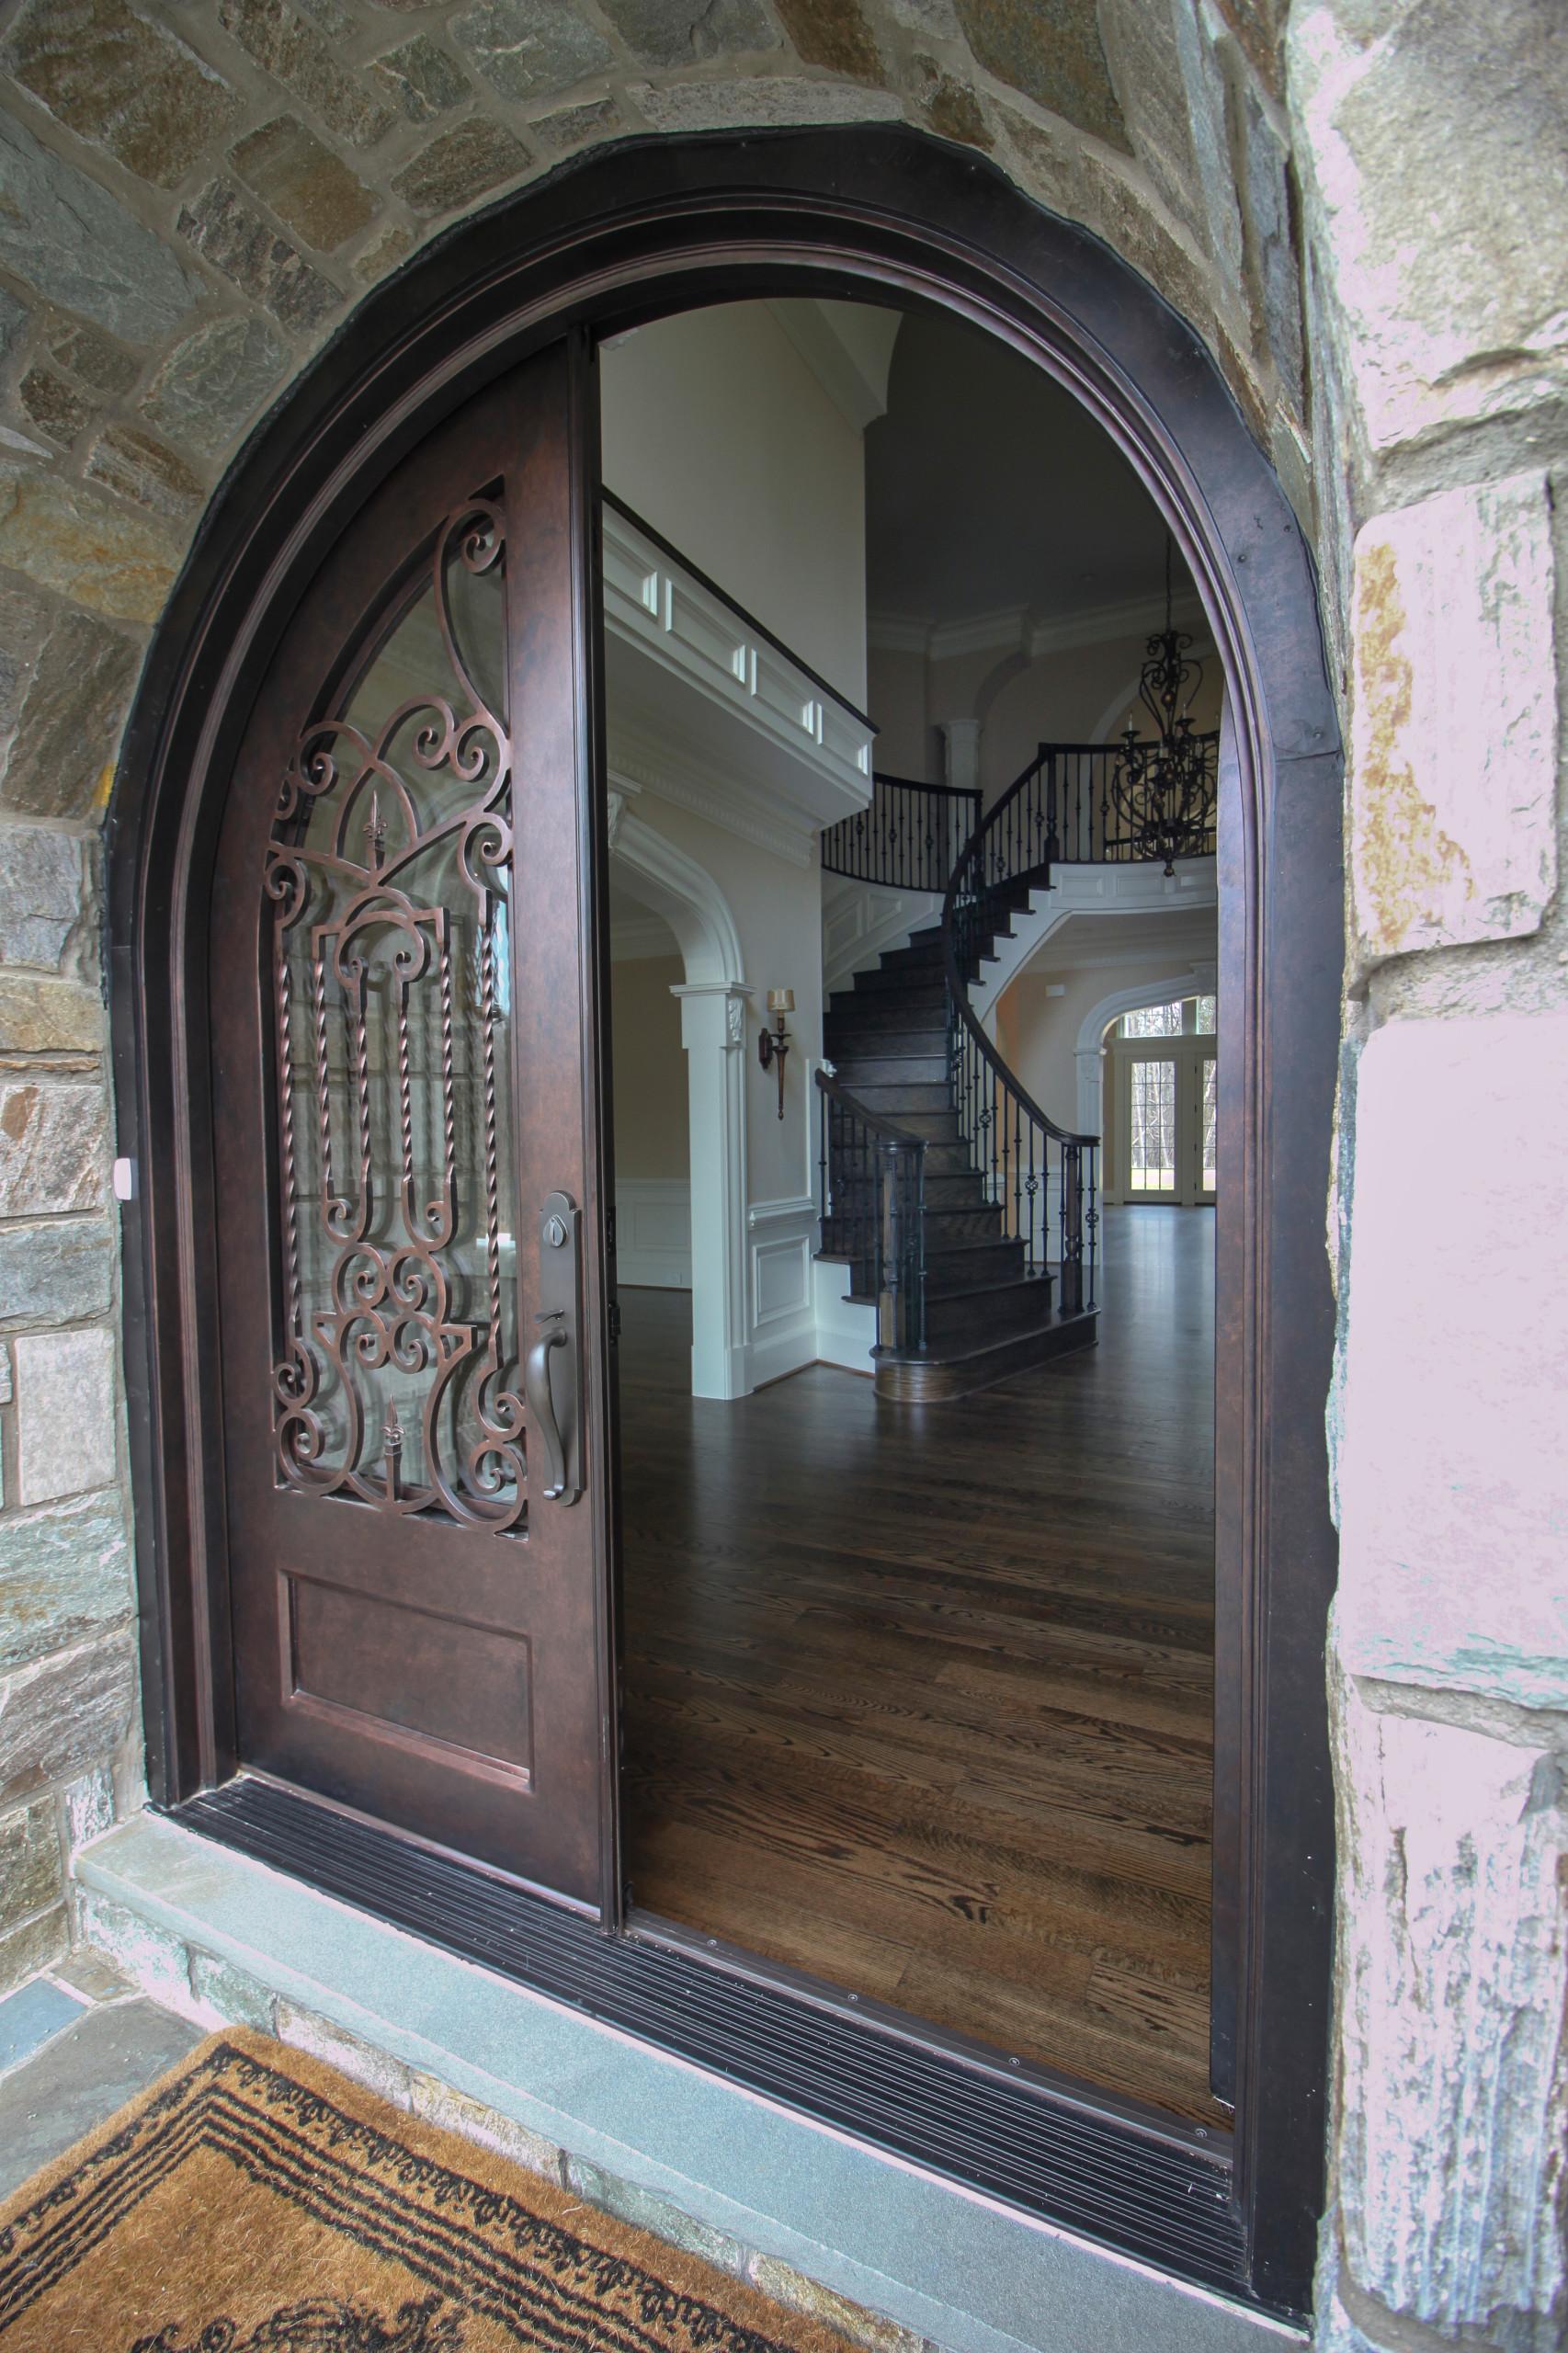 45_Inspiring Oak & Wrought Iron Balustrade in Stunning Residence, Mclean VA 2210